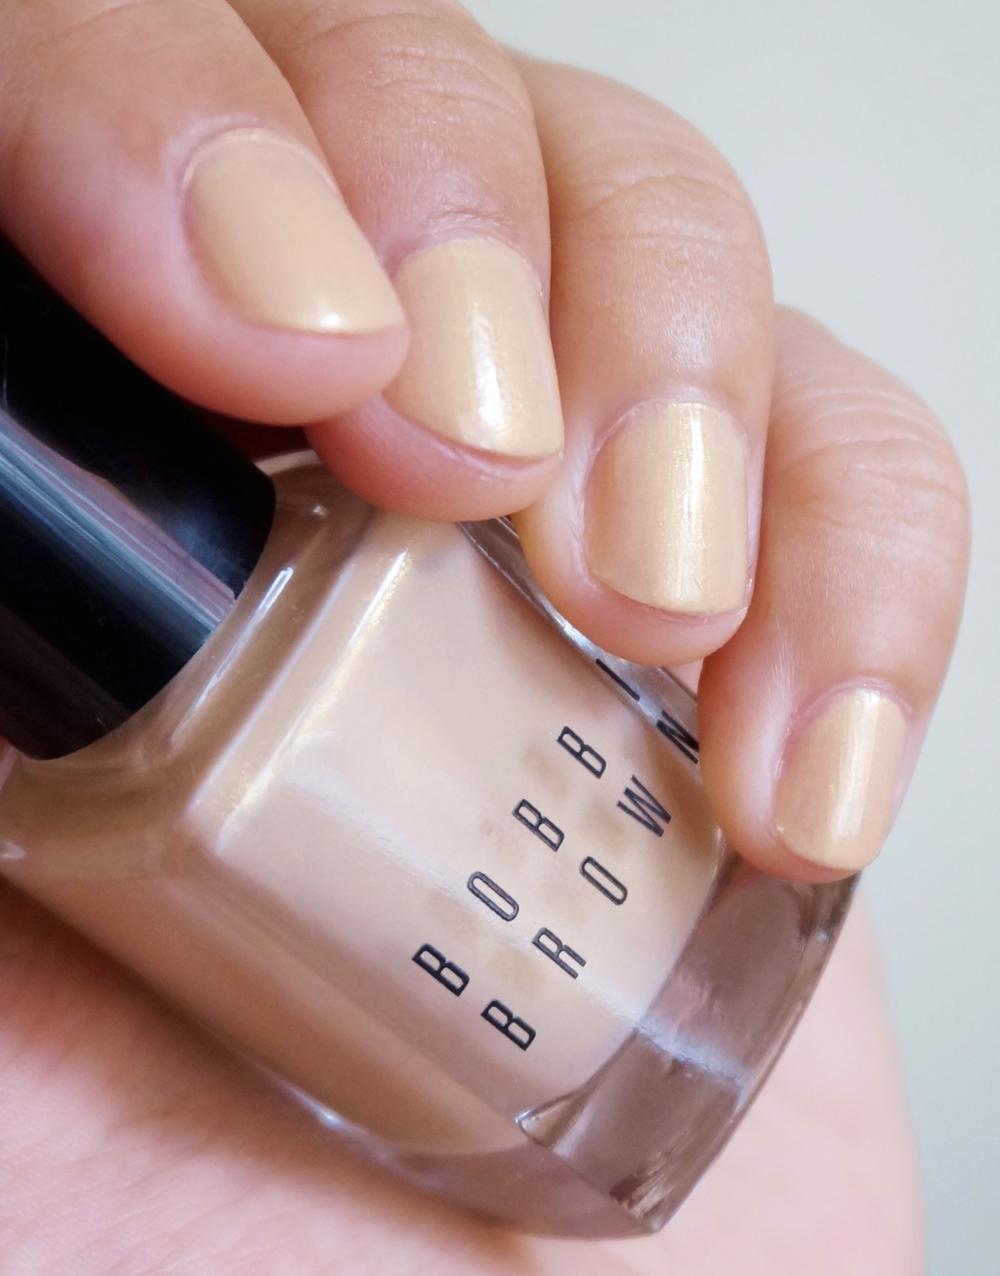 Bobbi Brown Week: Shimmer Nail Polish in Golden Beige — Project Vanity